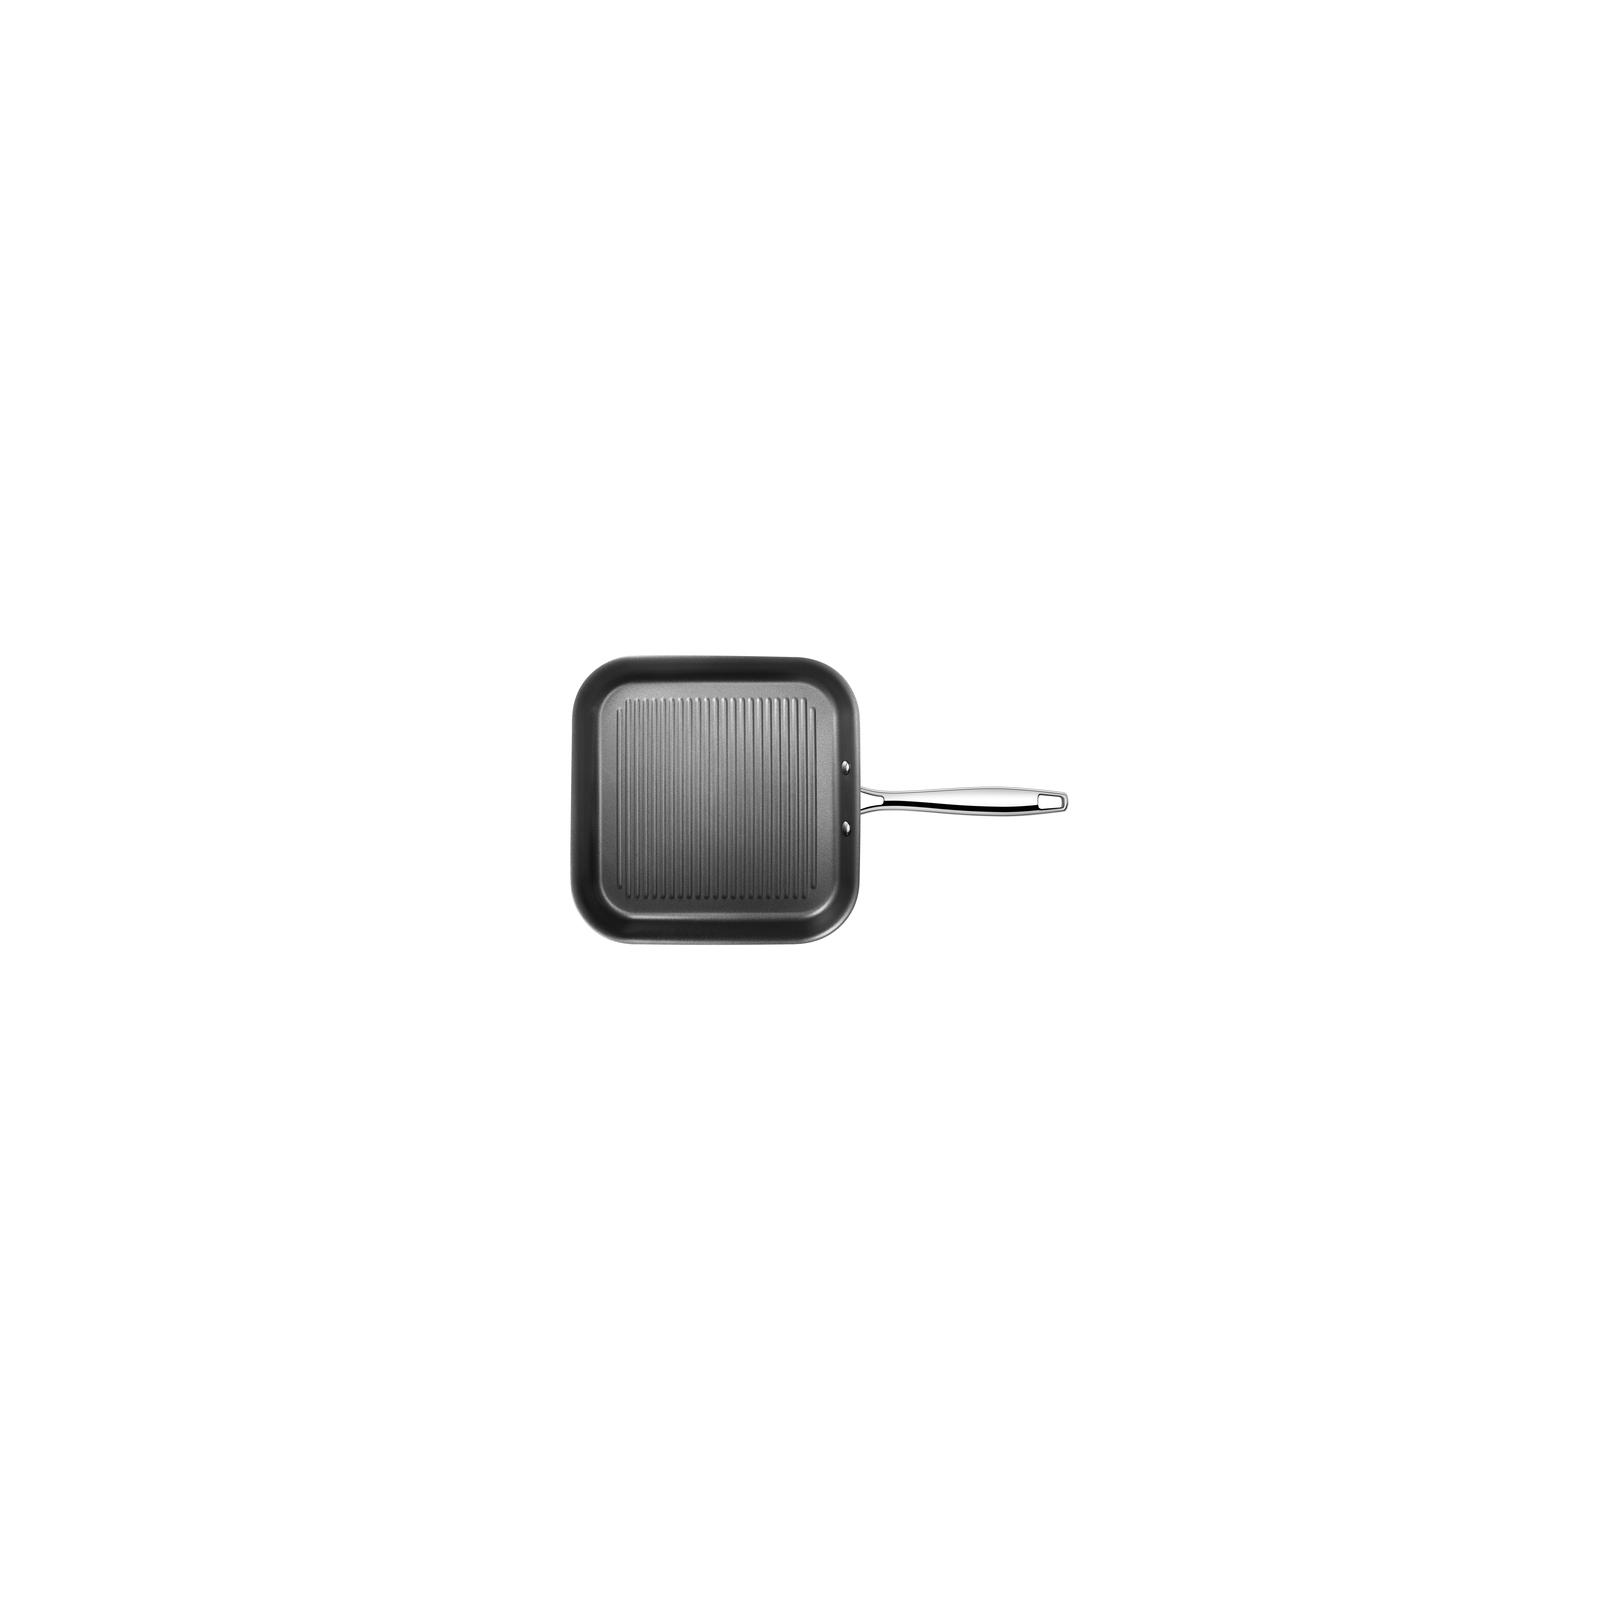 Сковорода Tramontina Professional Trix Grill 47 х 28 см (62839/288) изображение 2